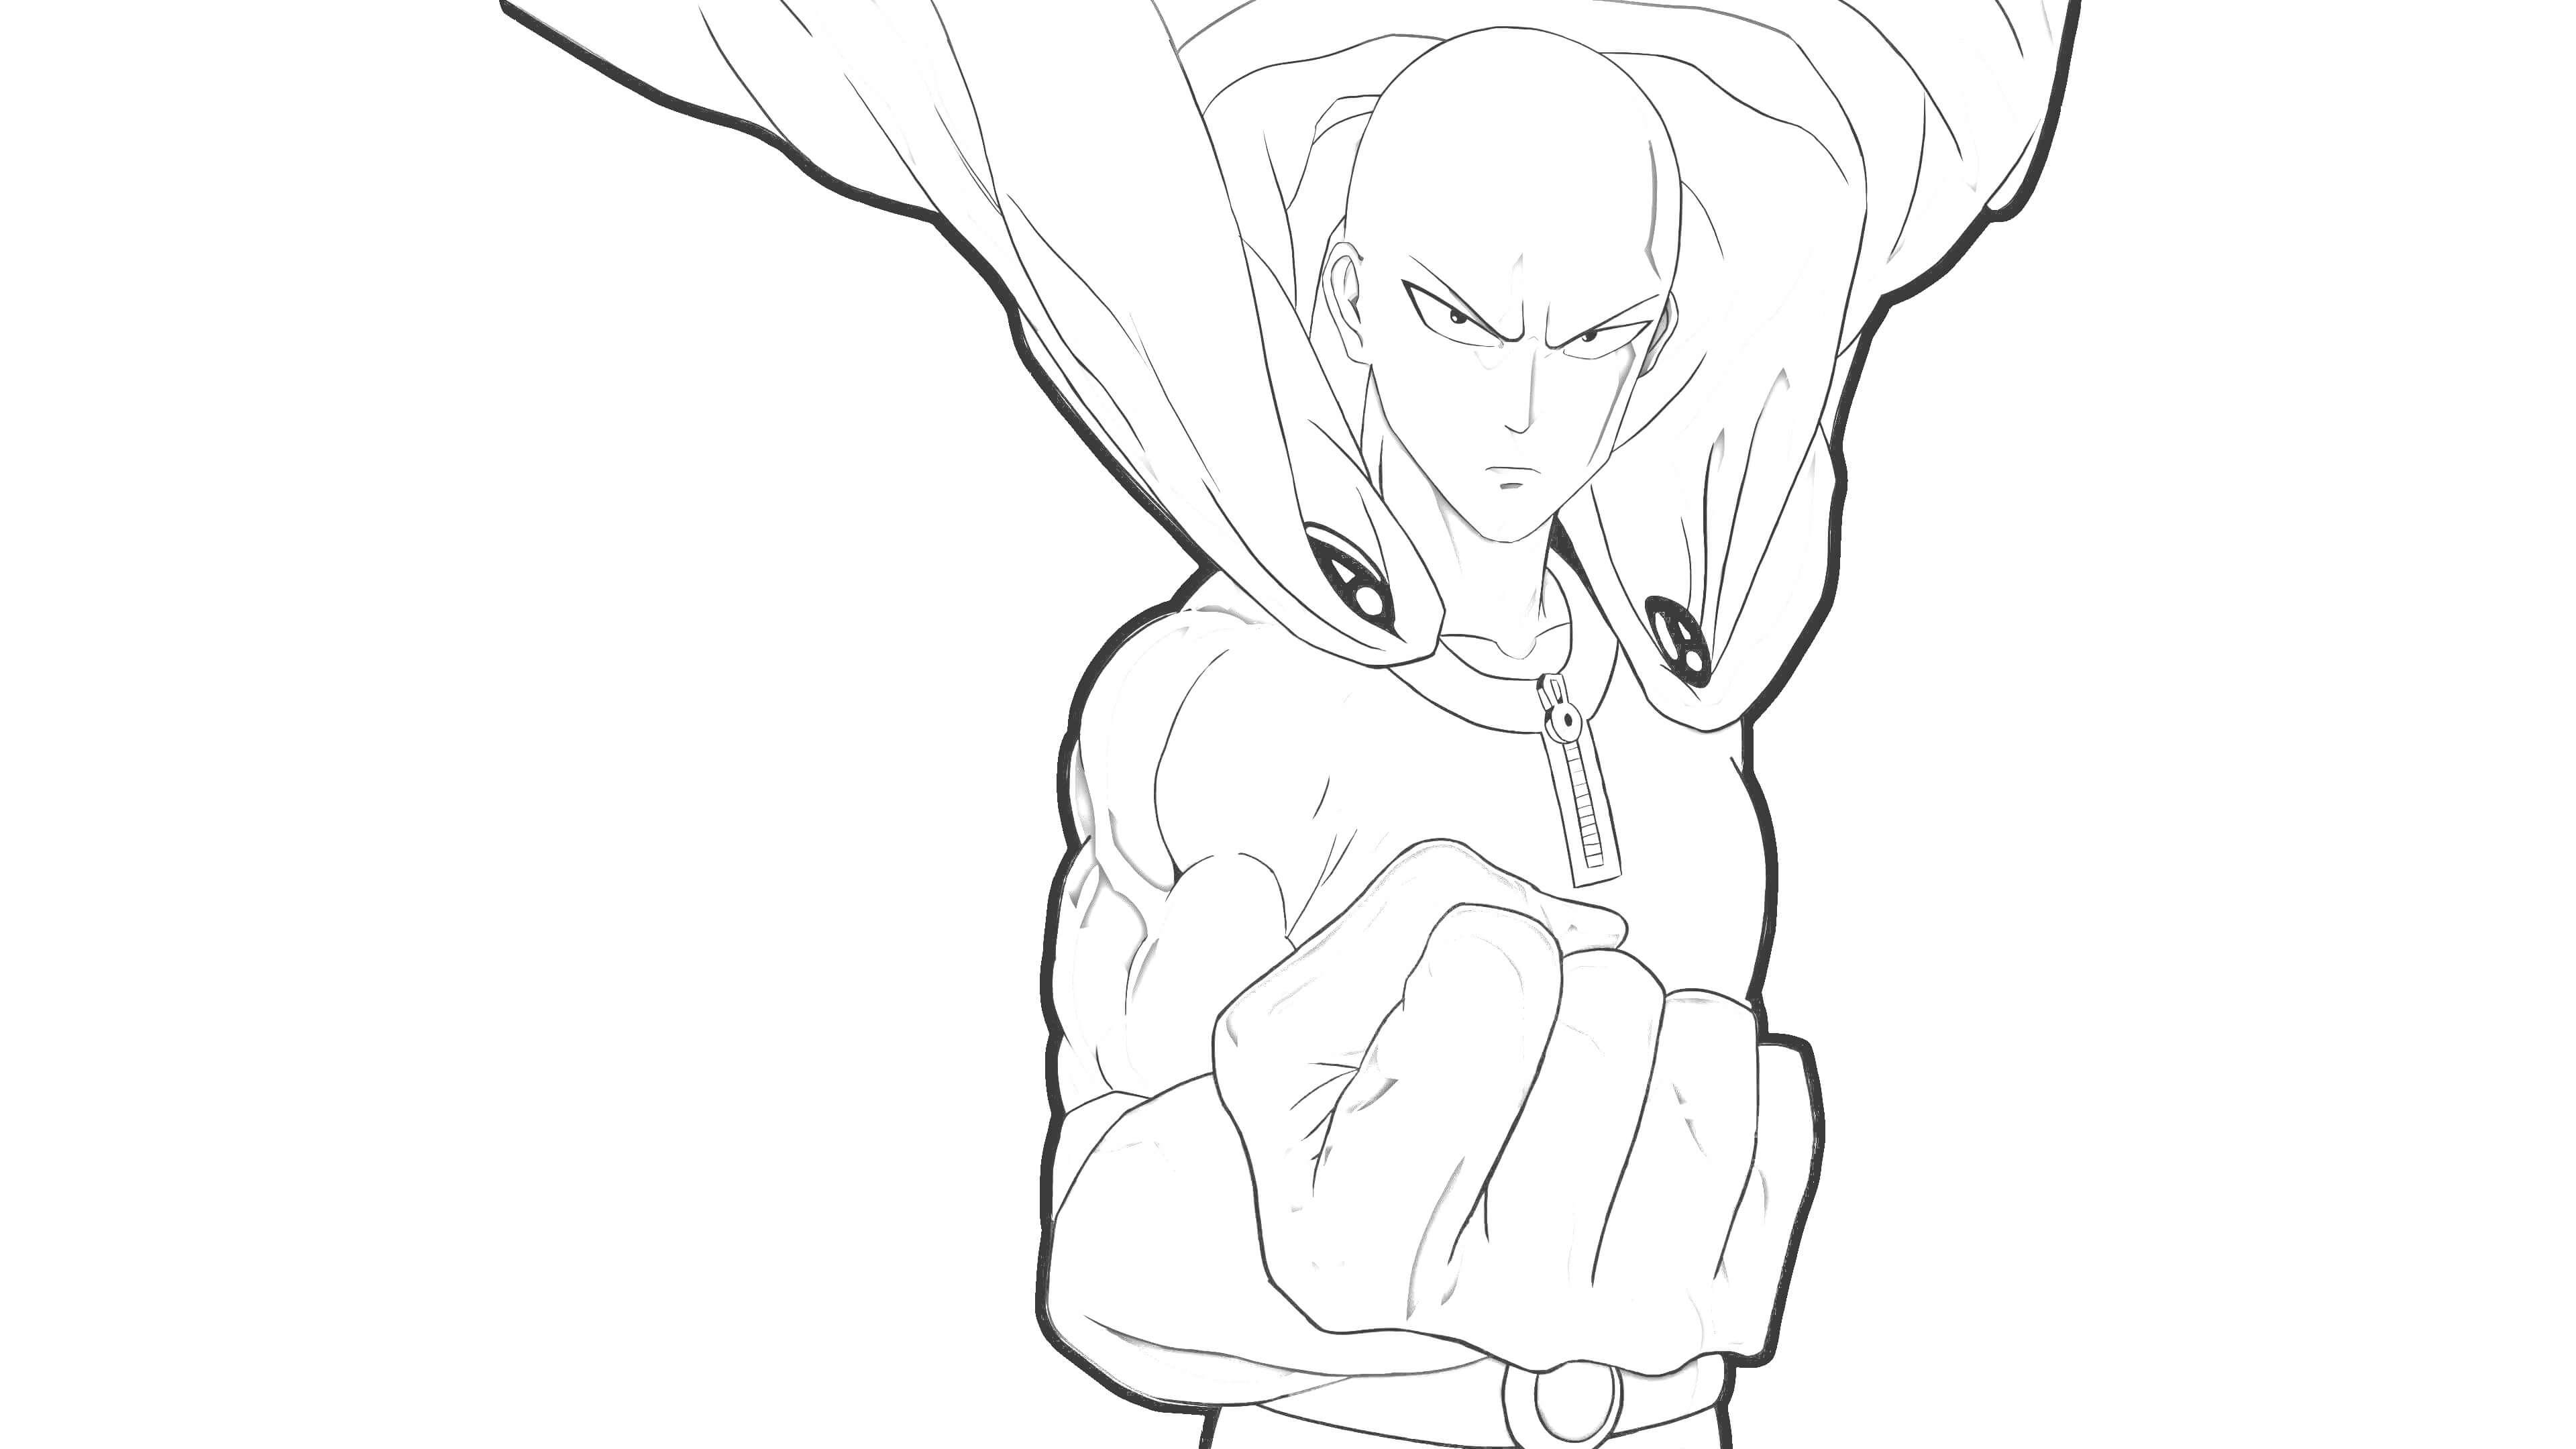 one punch man saitama mostrando punho - One punch man Saitama mostrando punho